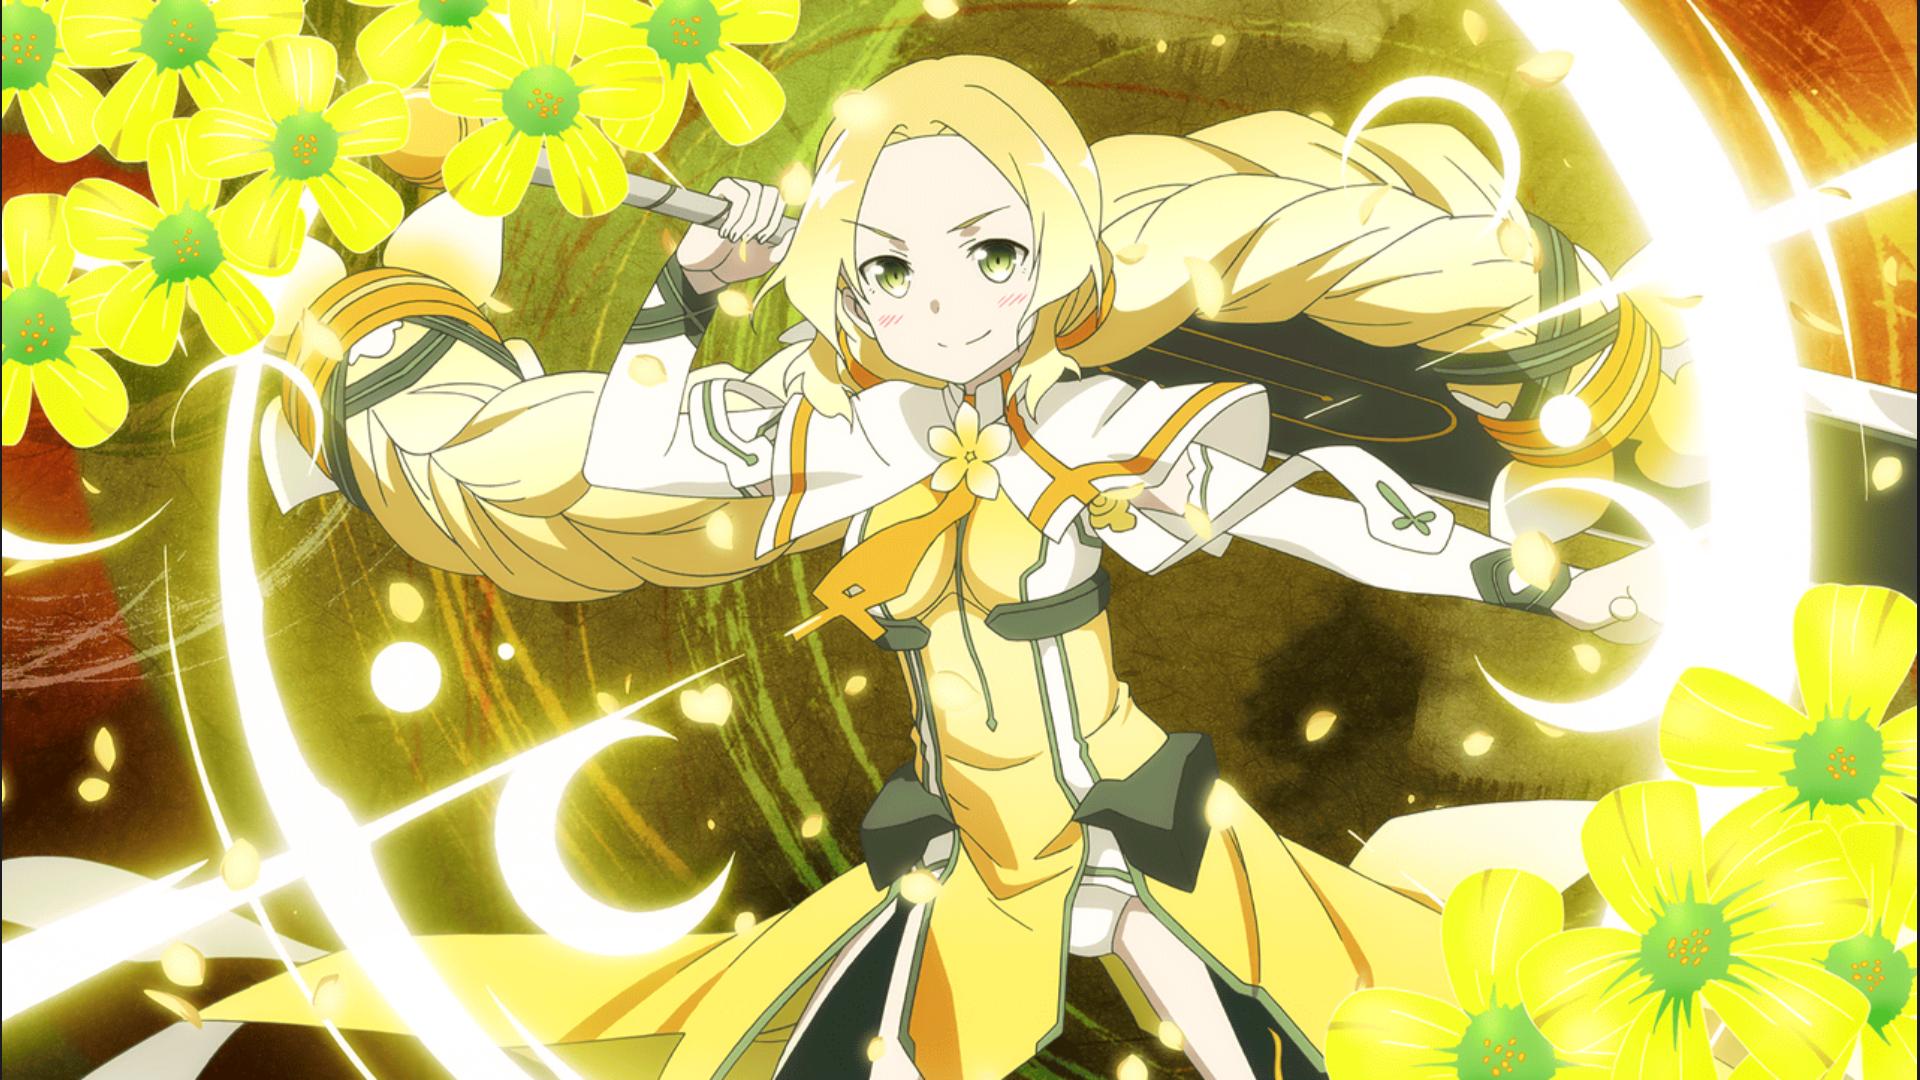 Wallpaper Yellow Inubouzaki Fu Oxalis Yuki Yuna Is A Hero